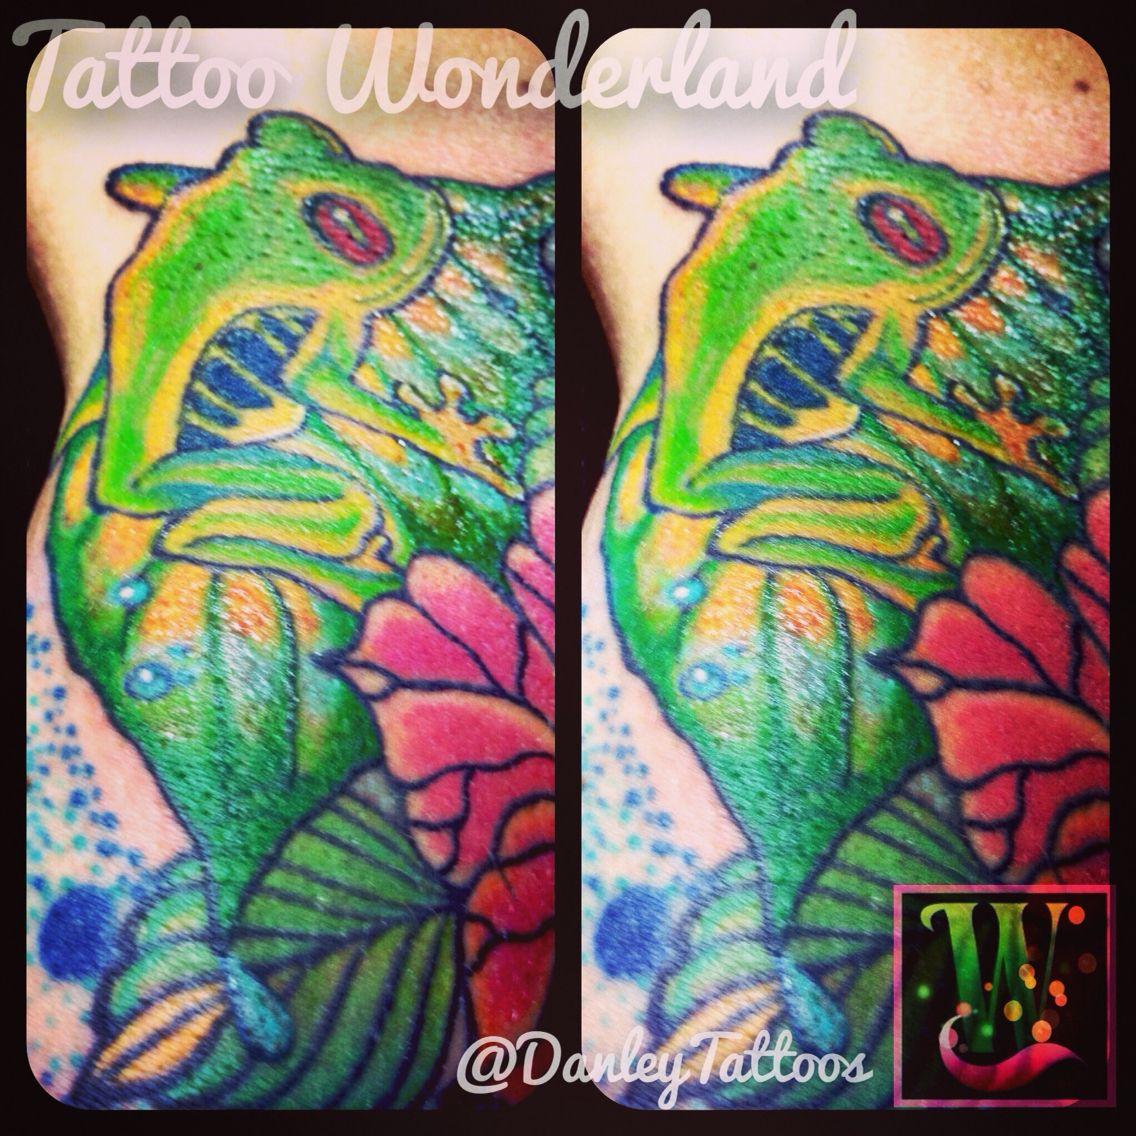 Pin by Tattoo Wonderland on Christopher Danley Tattoos | Pinterest ...